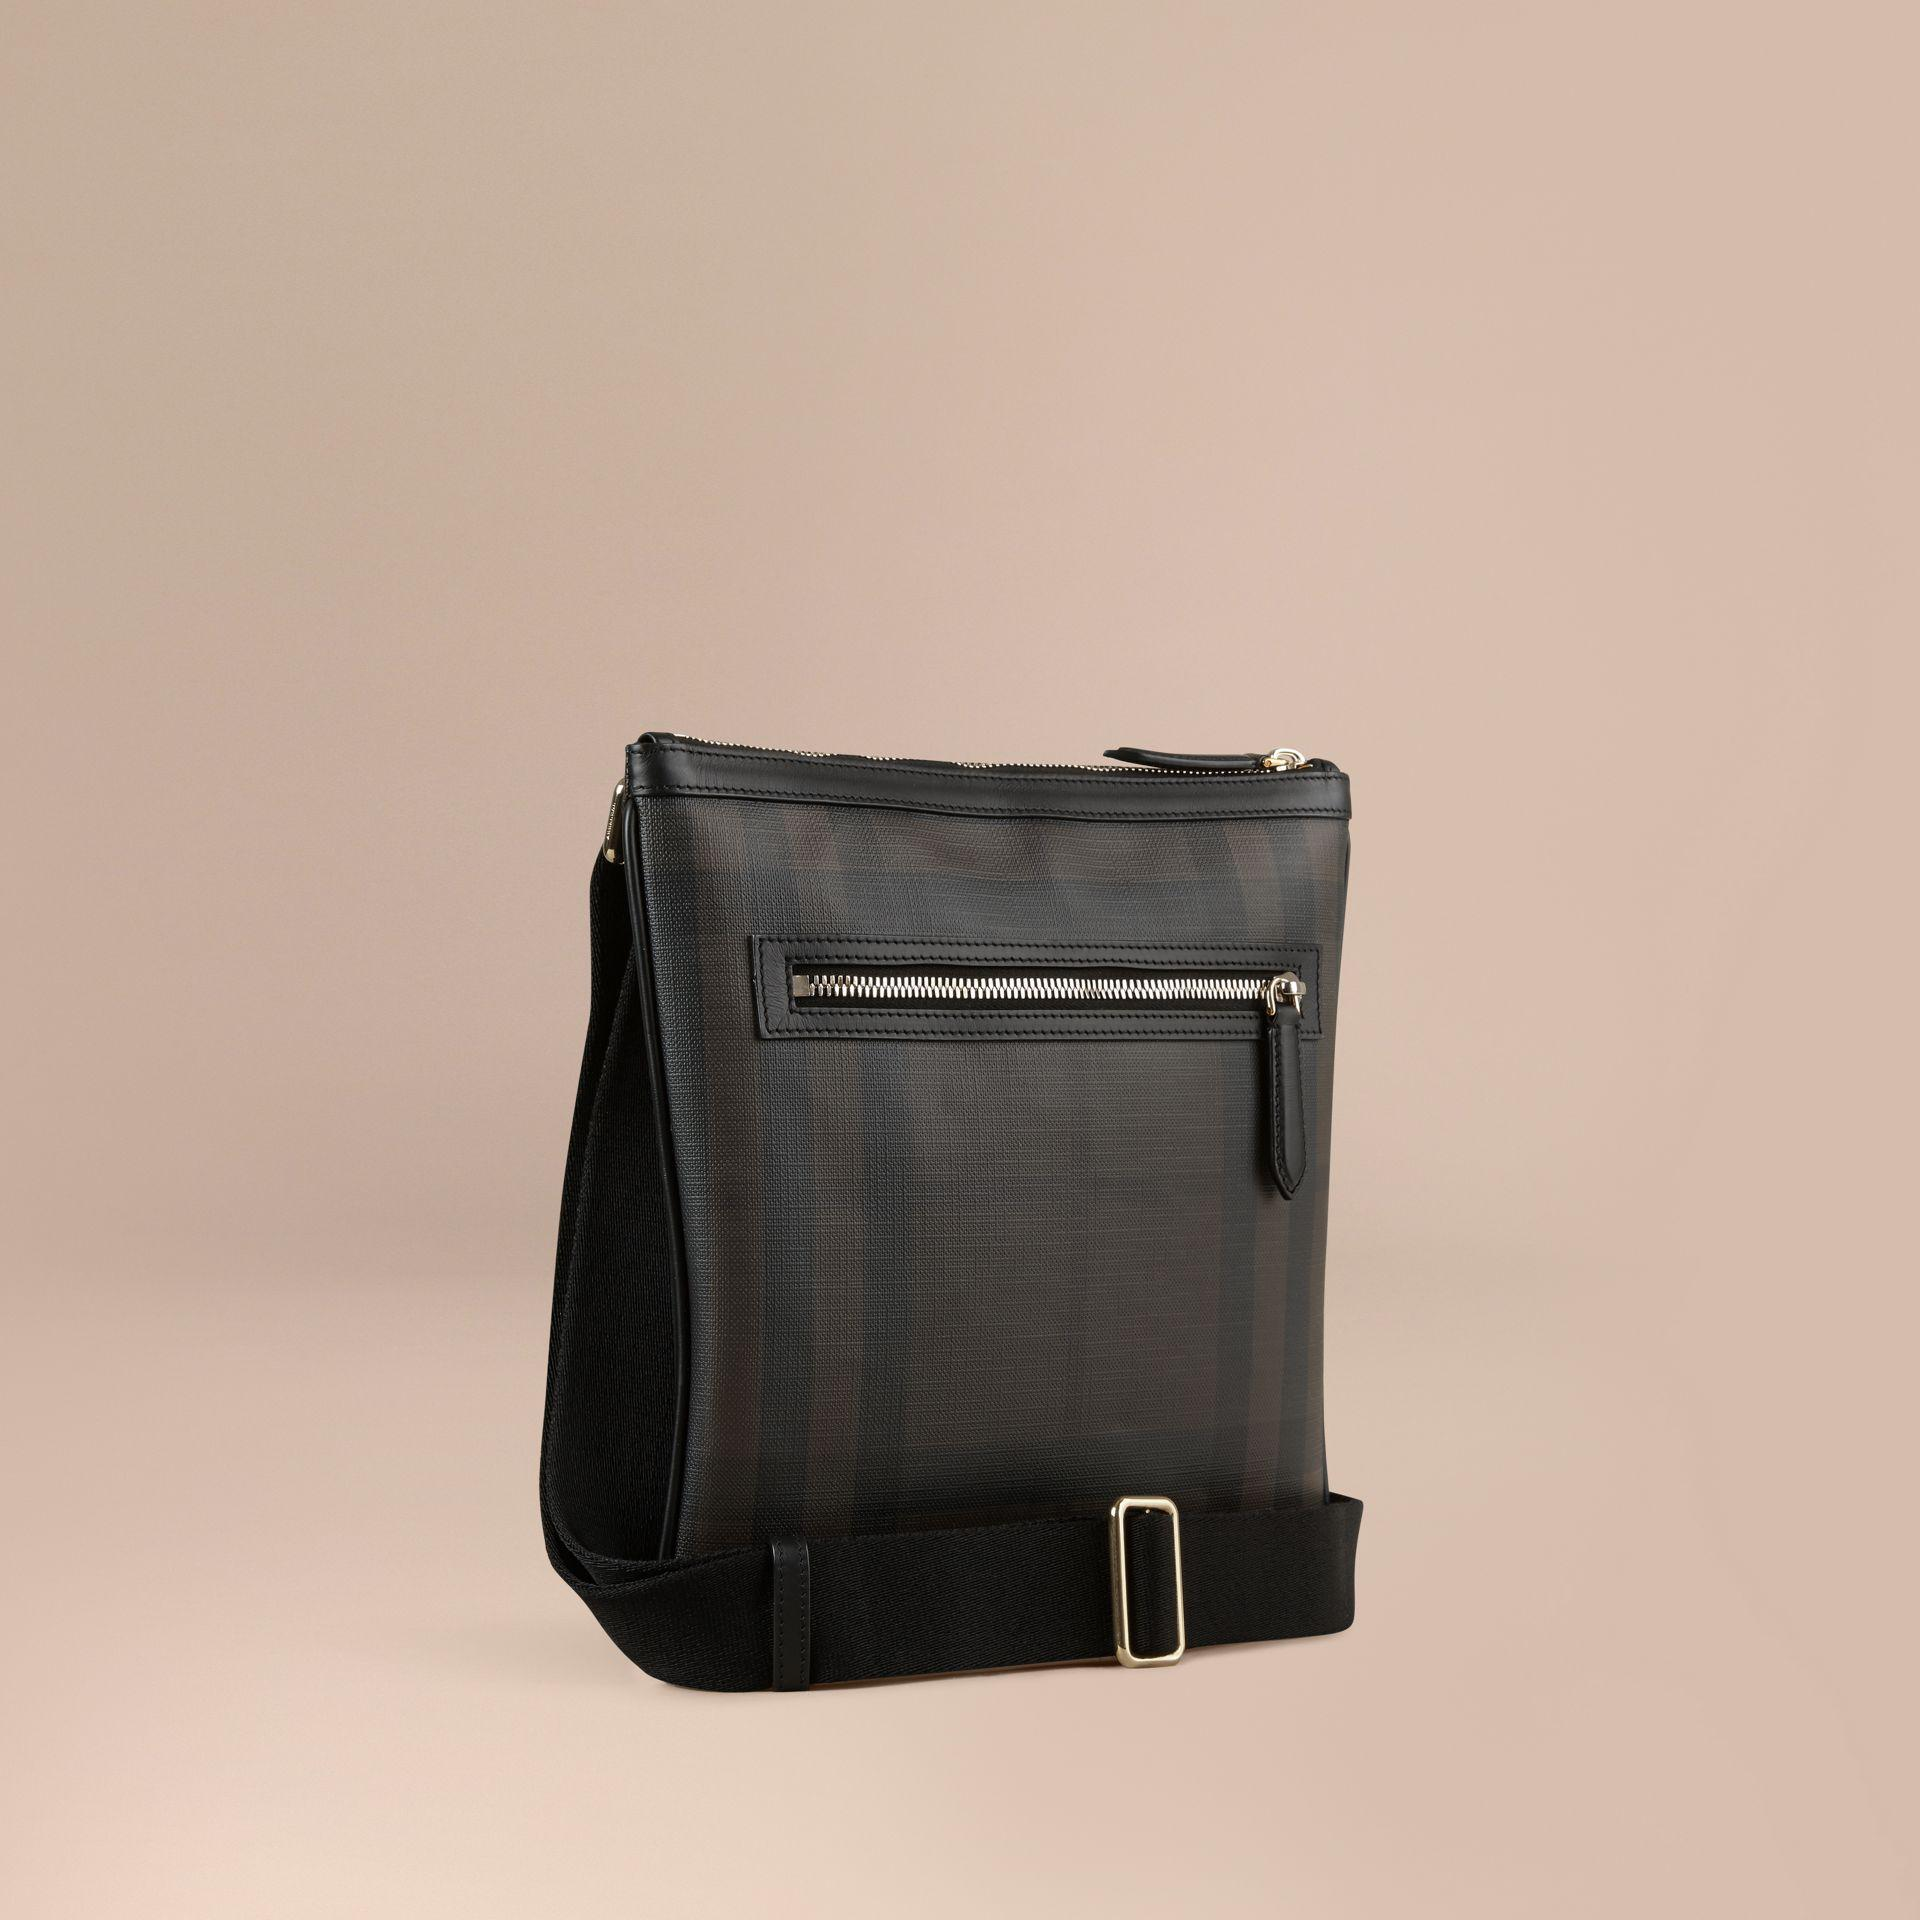 bf0c687bb4ef Lyst - Burberry Leather Trim London Check Crossbody Bag Chocolate ...